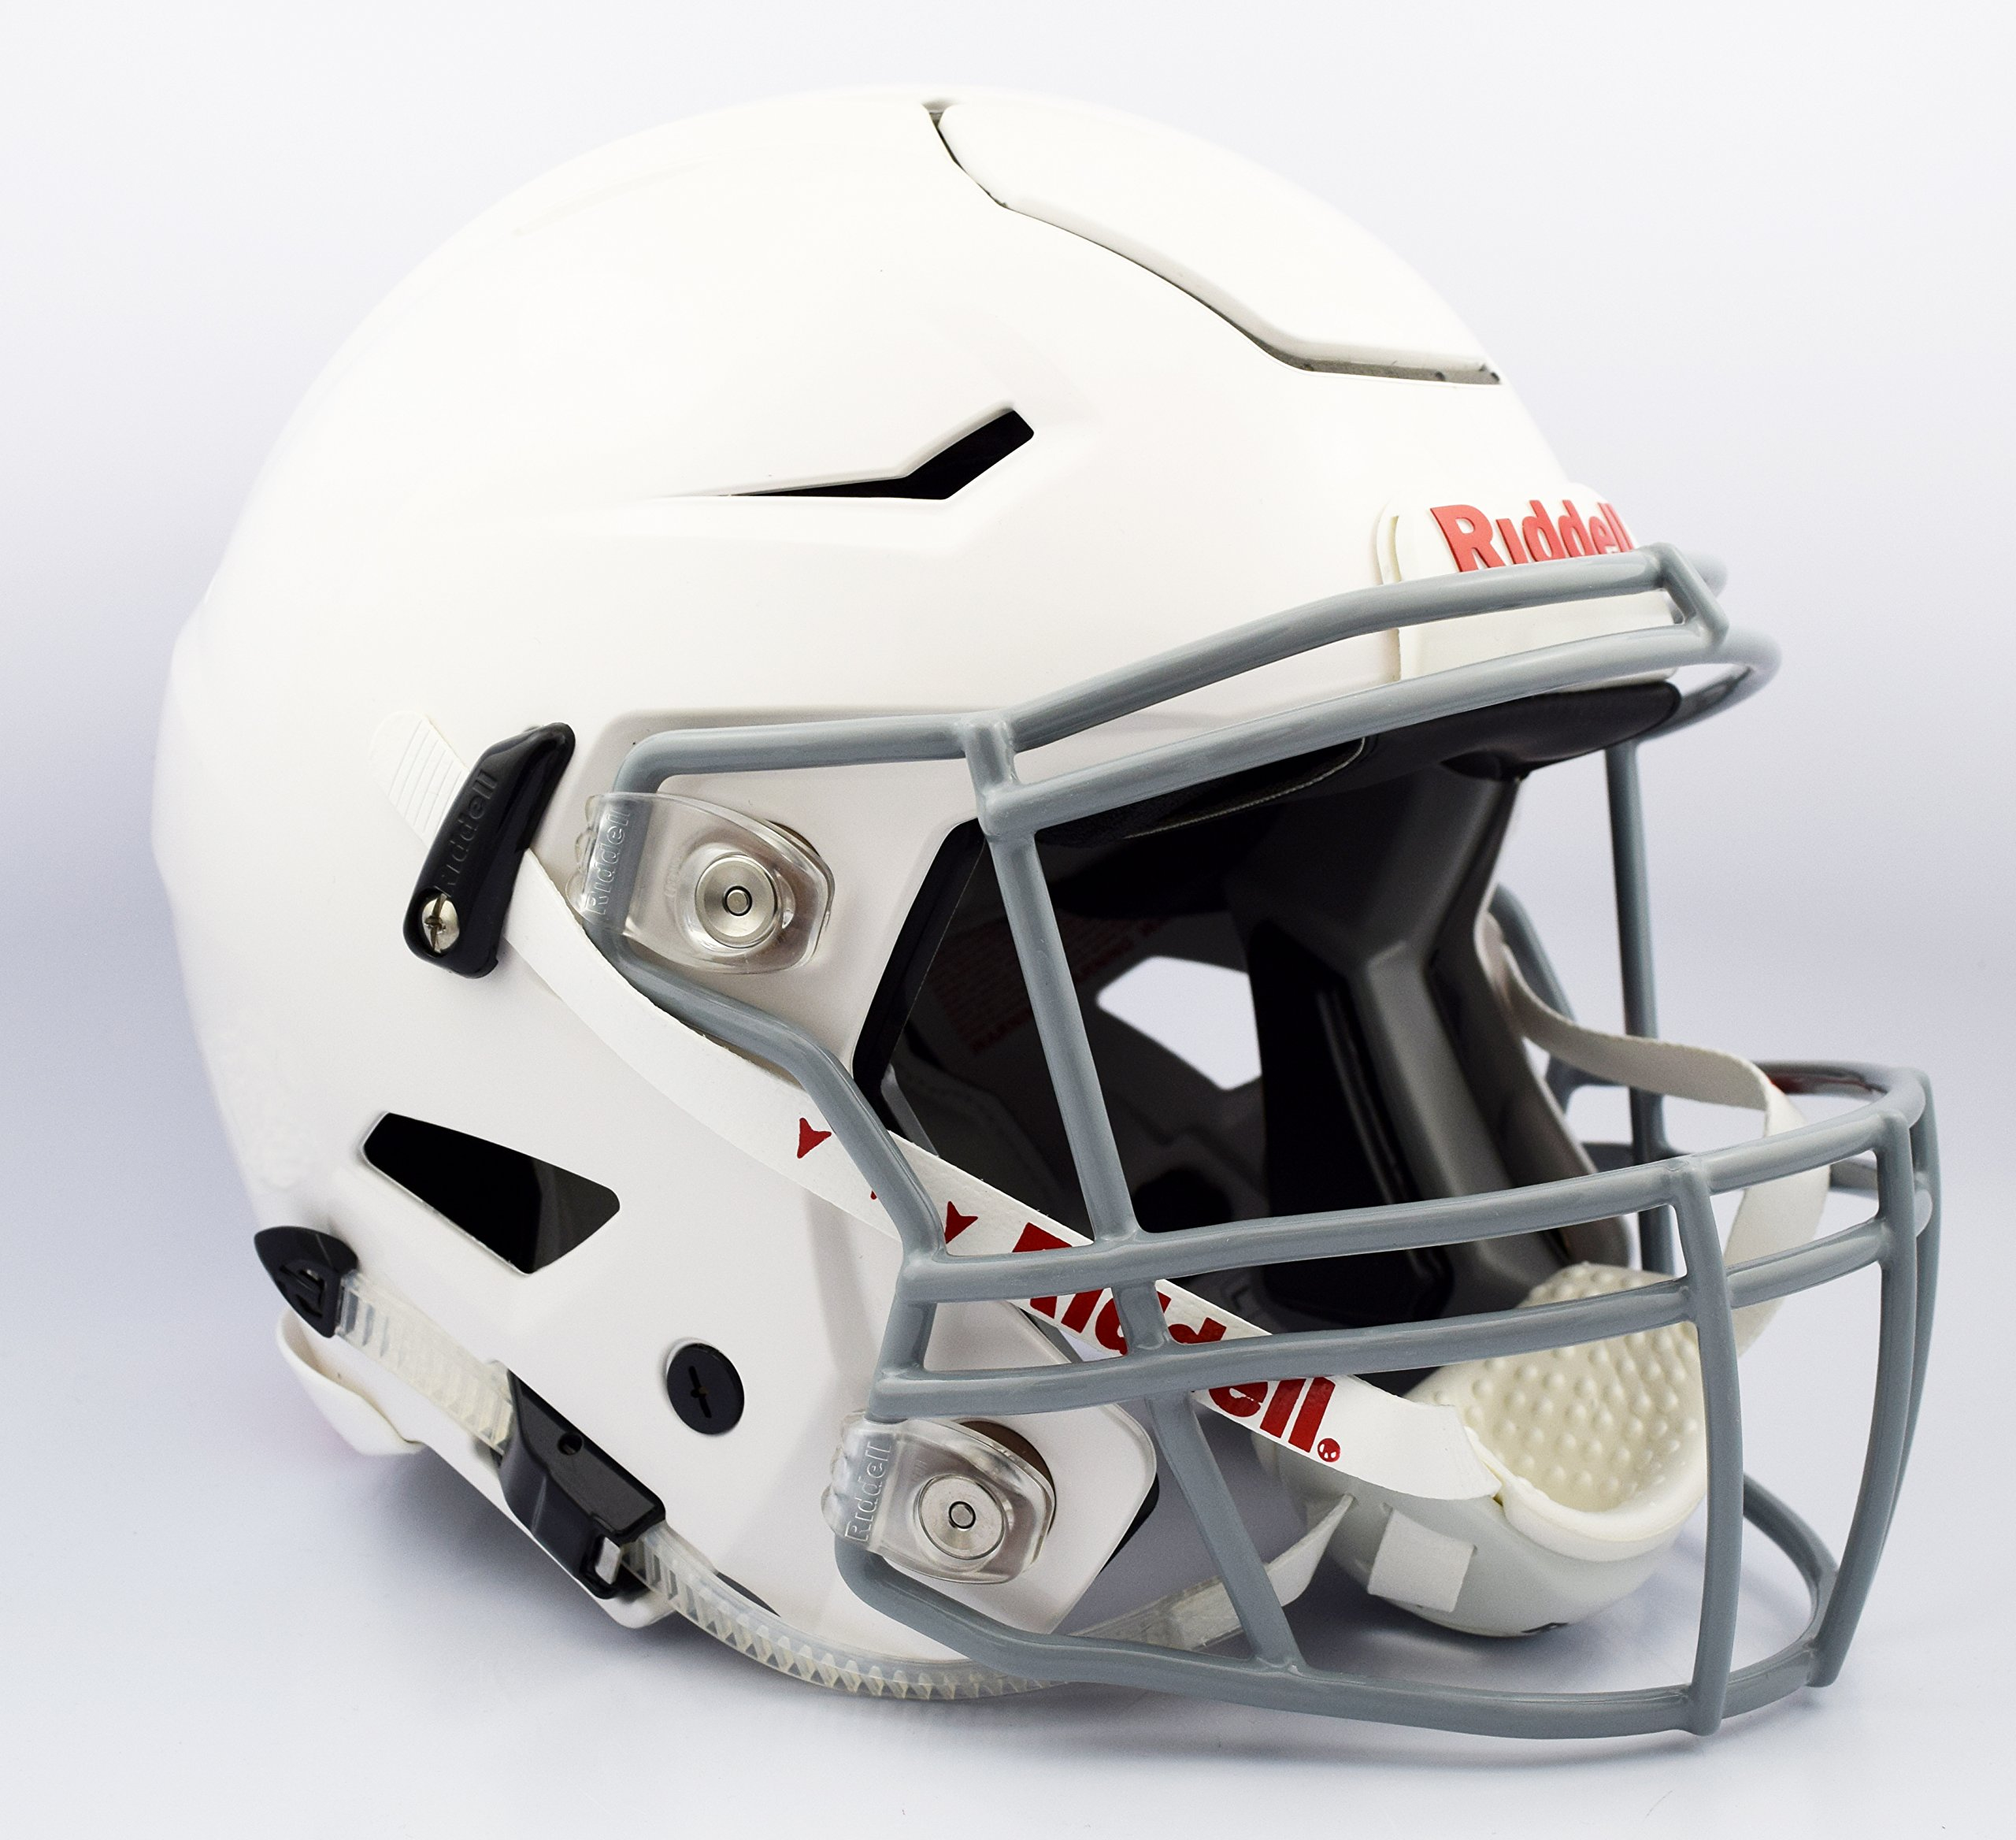 Riddell Speedflex Youth Helmet, White/Gray, Medium